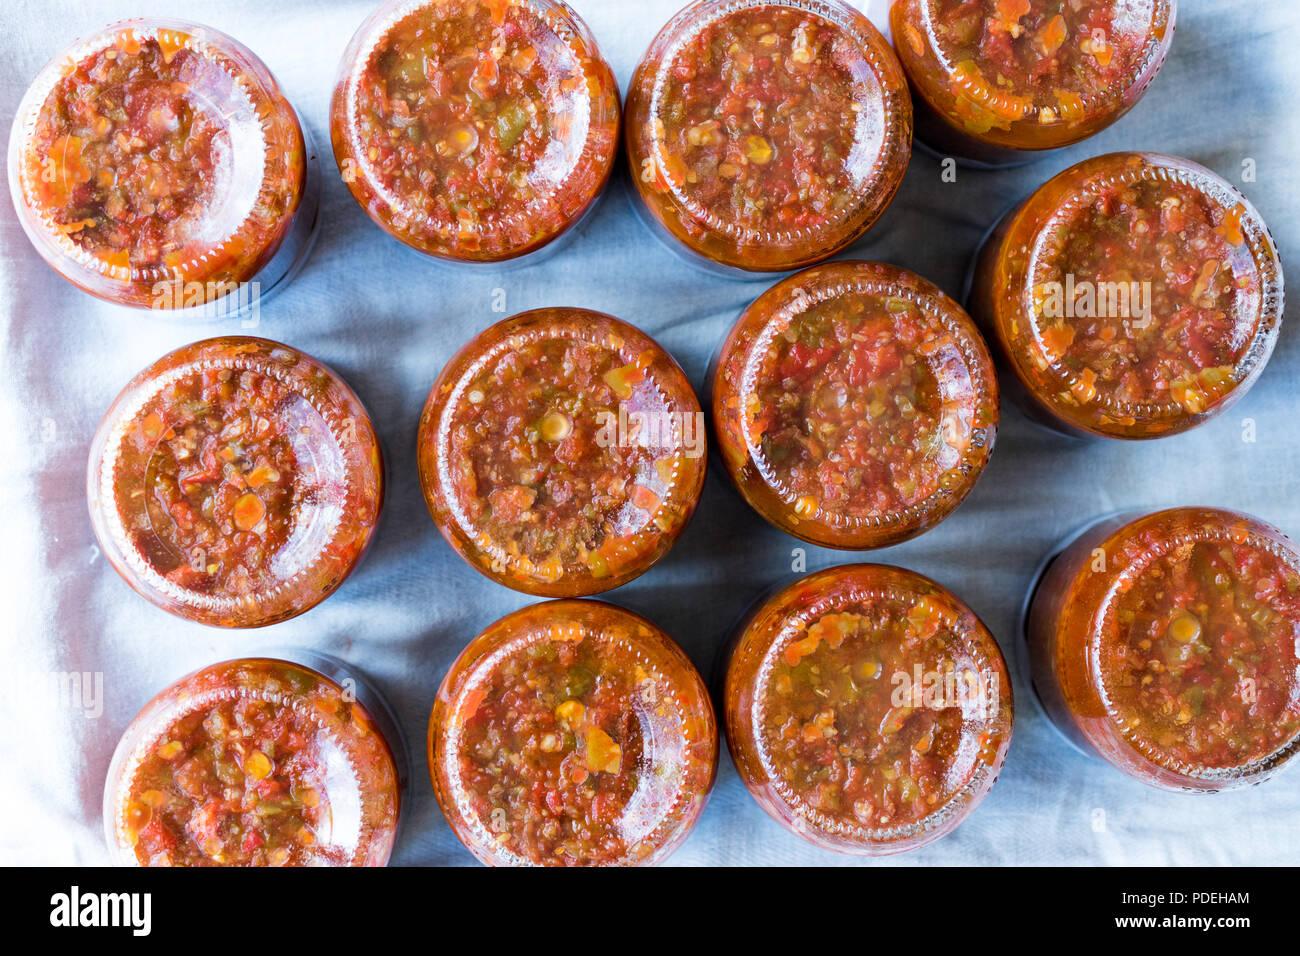 Homemade Preserved Tomato Paste Sauce in Glass Jar. Organic Food. Stock Photo